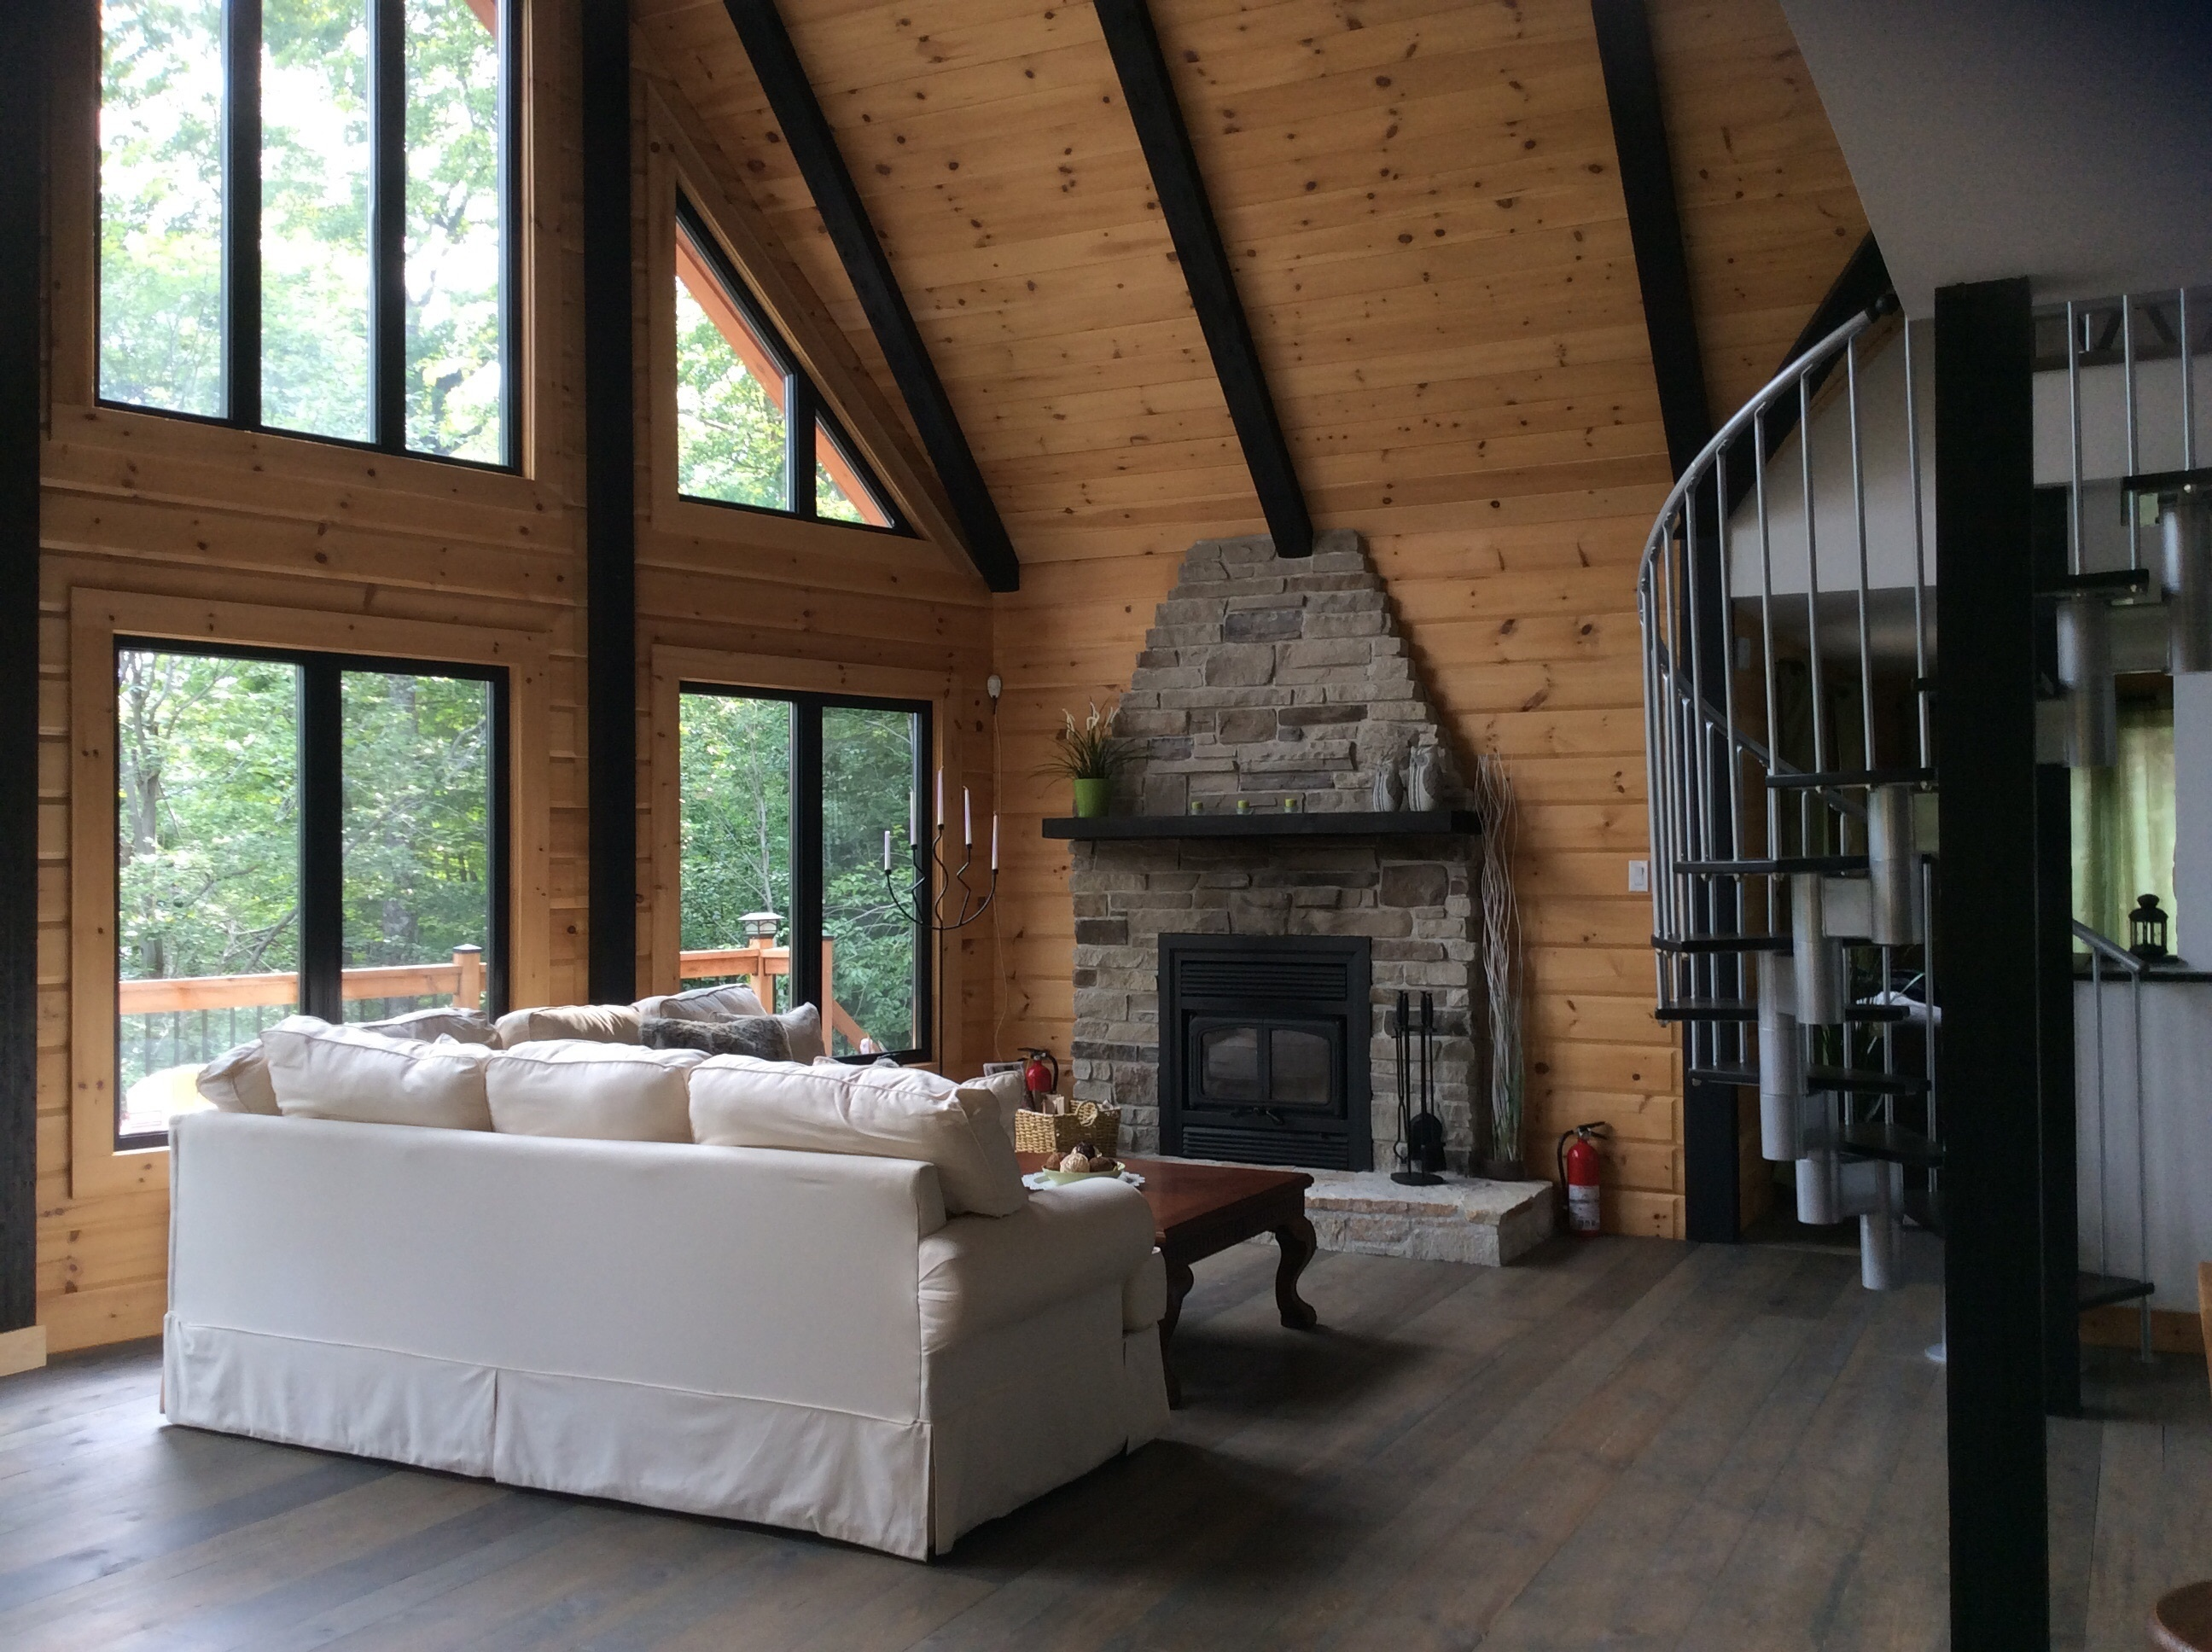 interior-fireplace-1.jpg